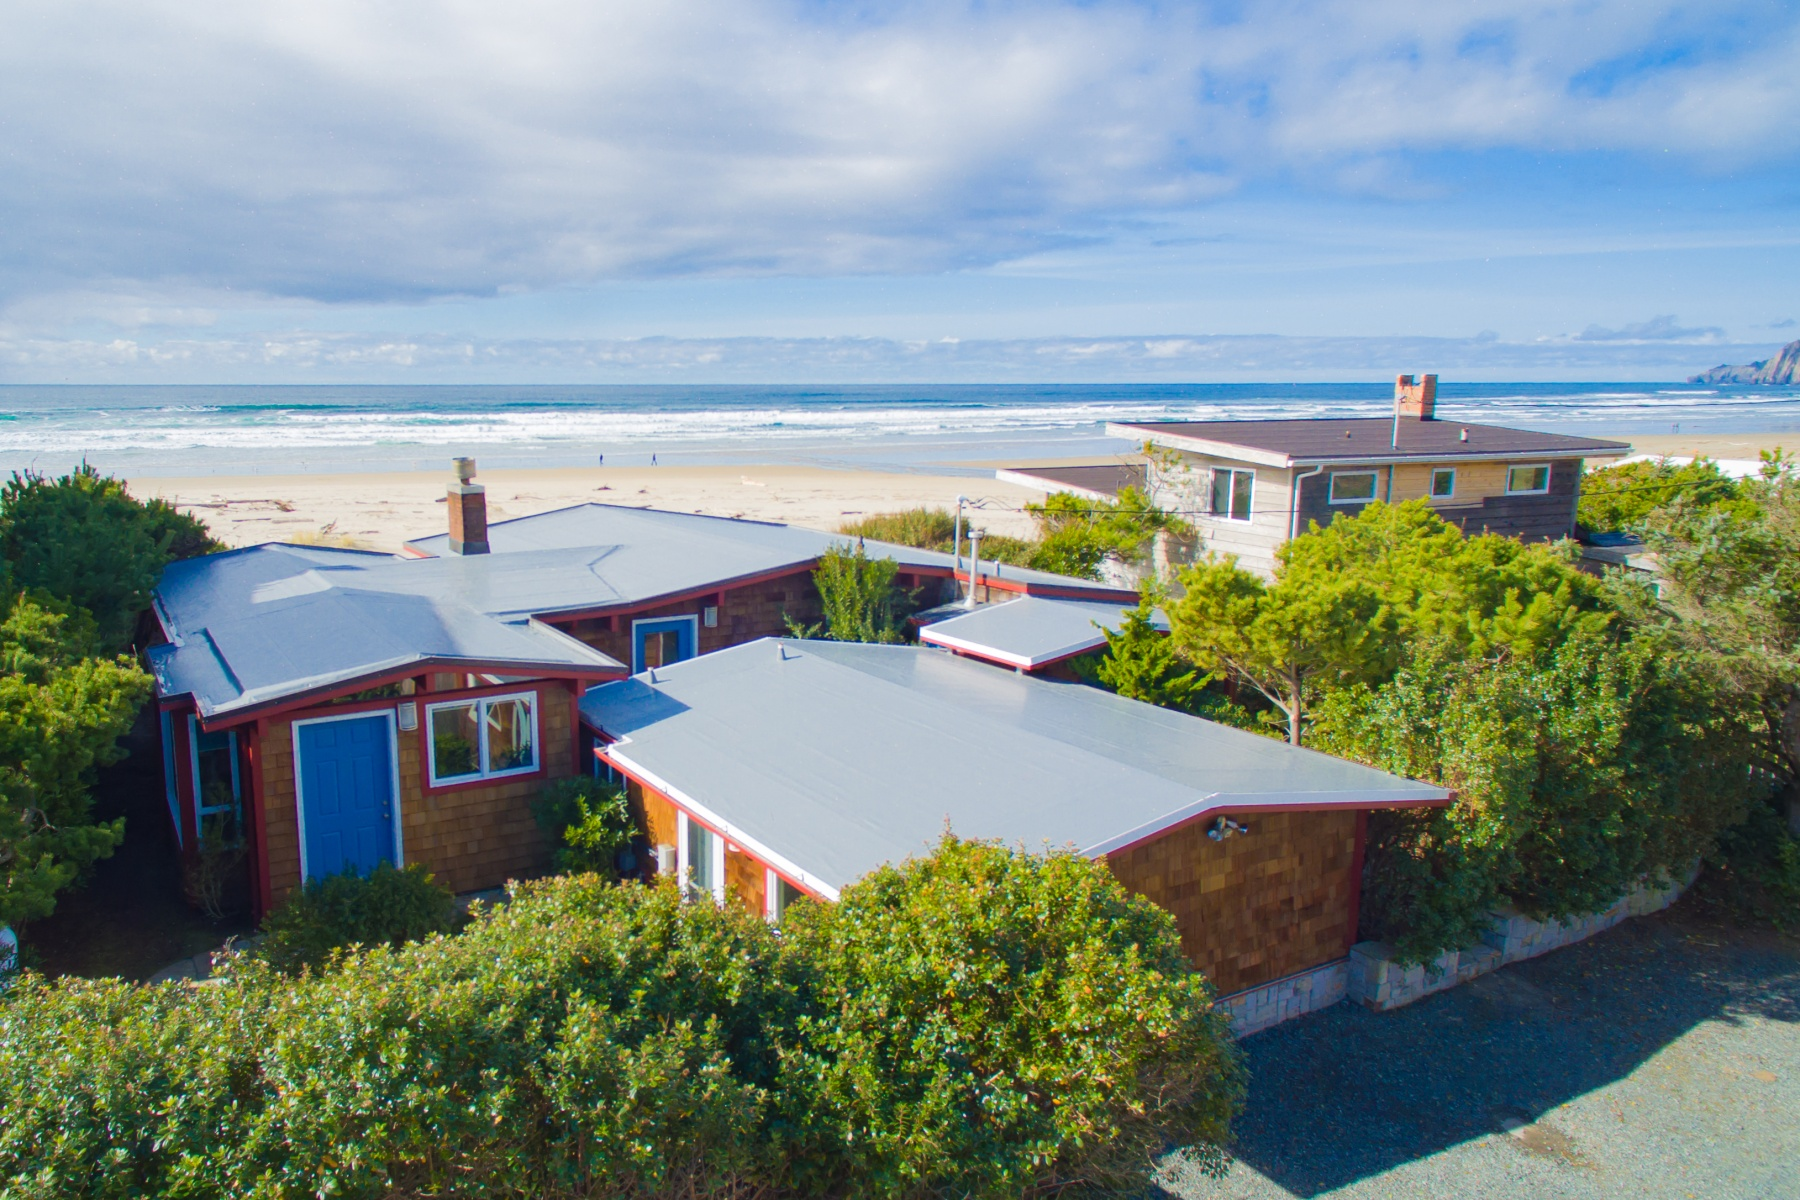 Single Family Home for Sale at 649 BEACH ST, MANZANITA, OR Manzanita, Oregon, 97130 United States